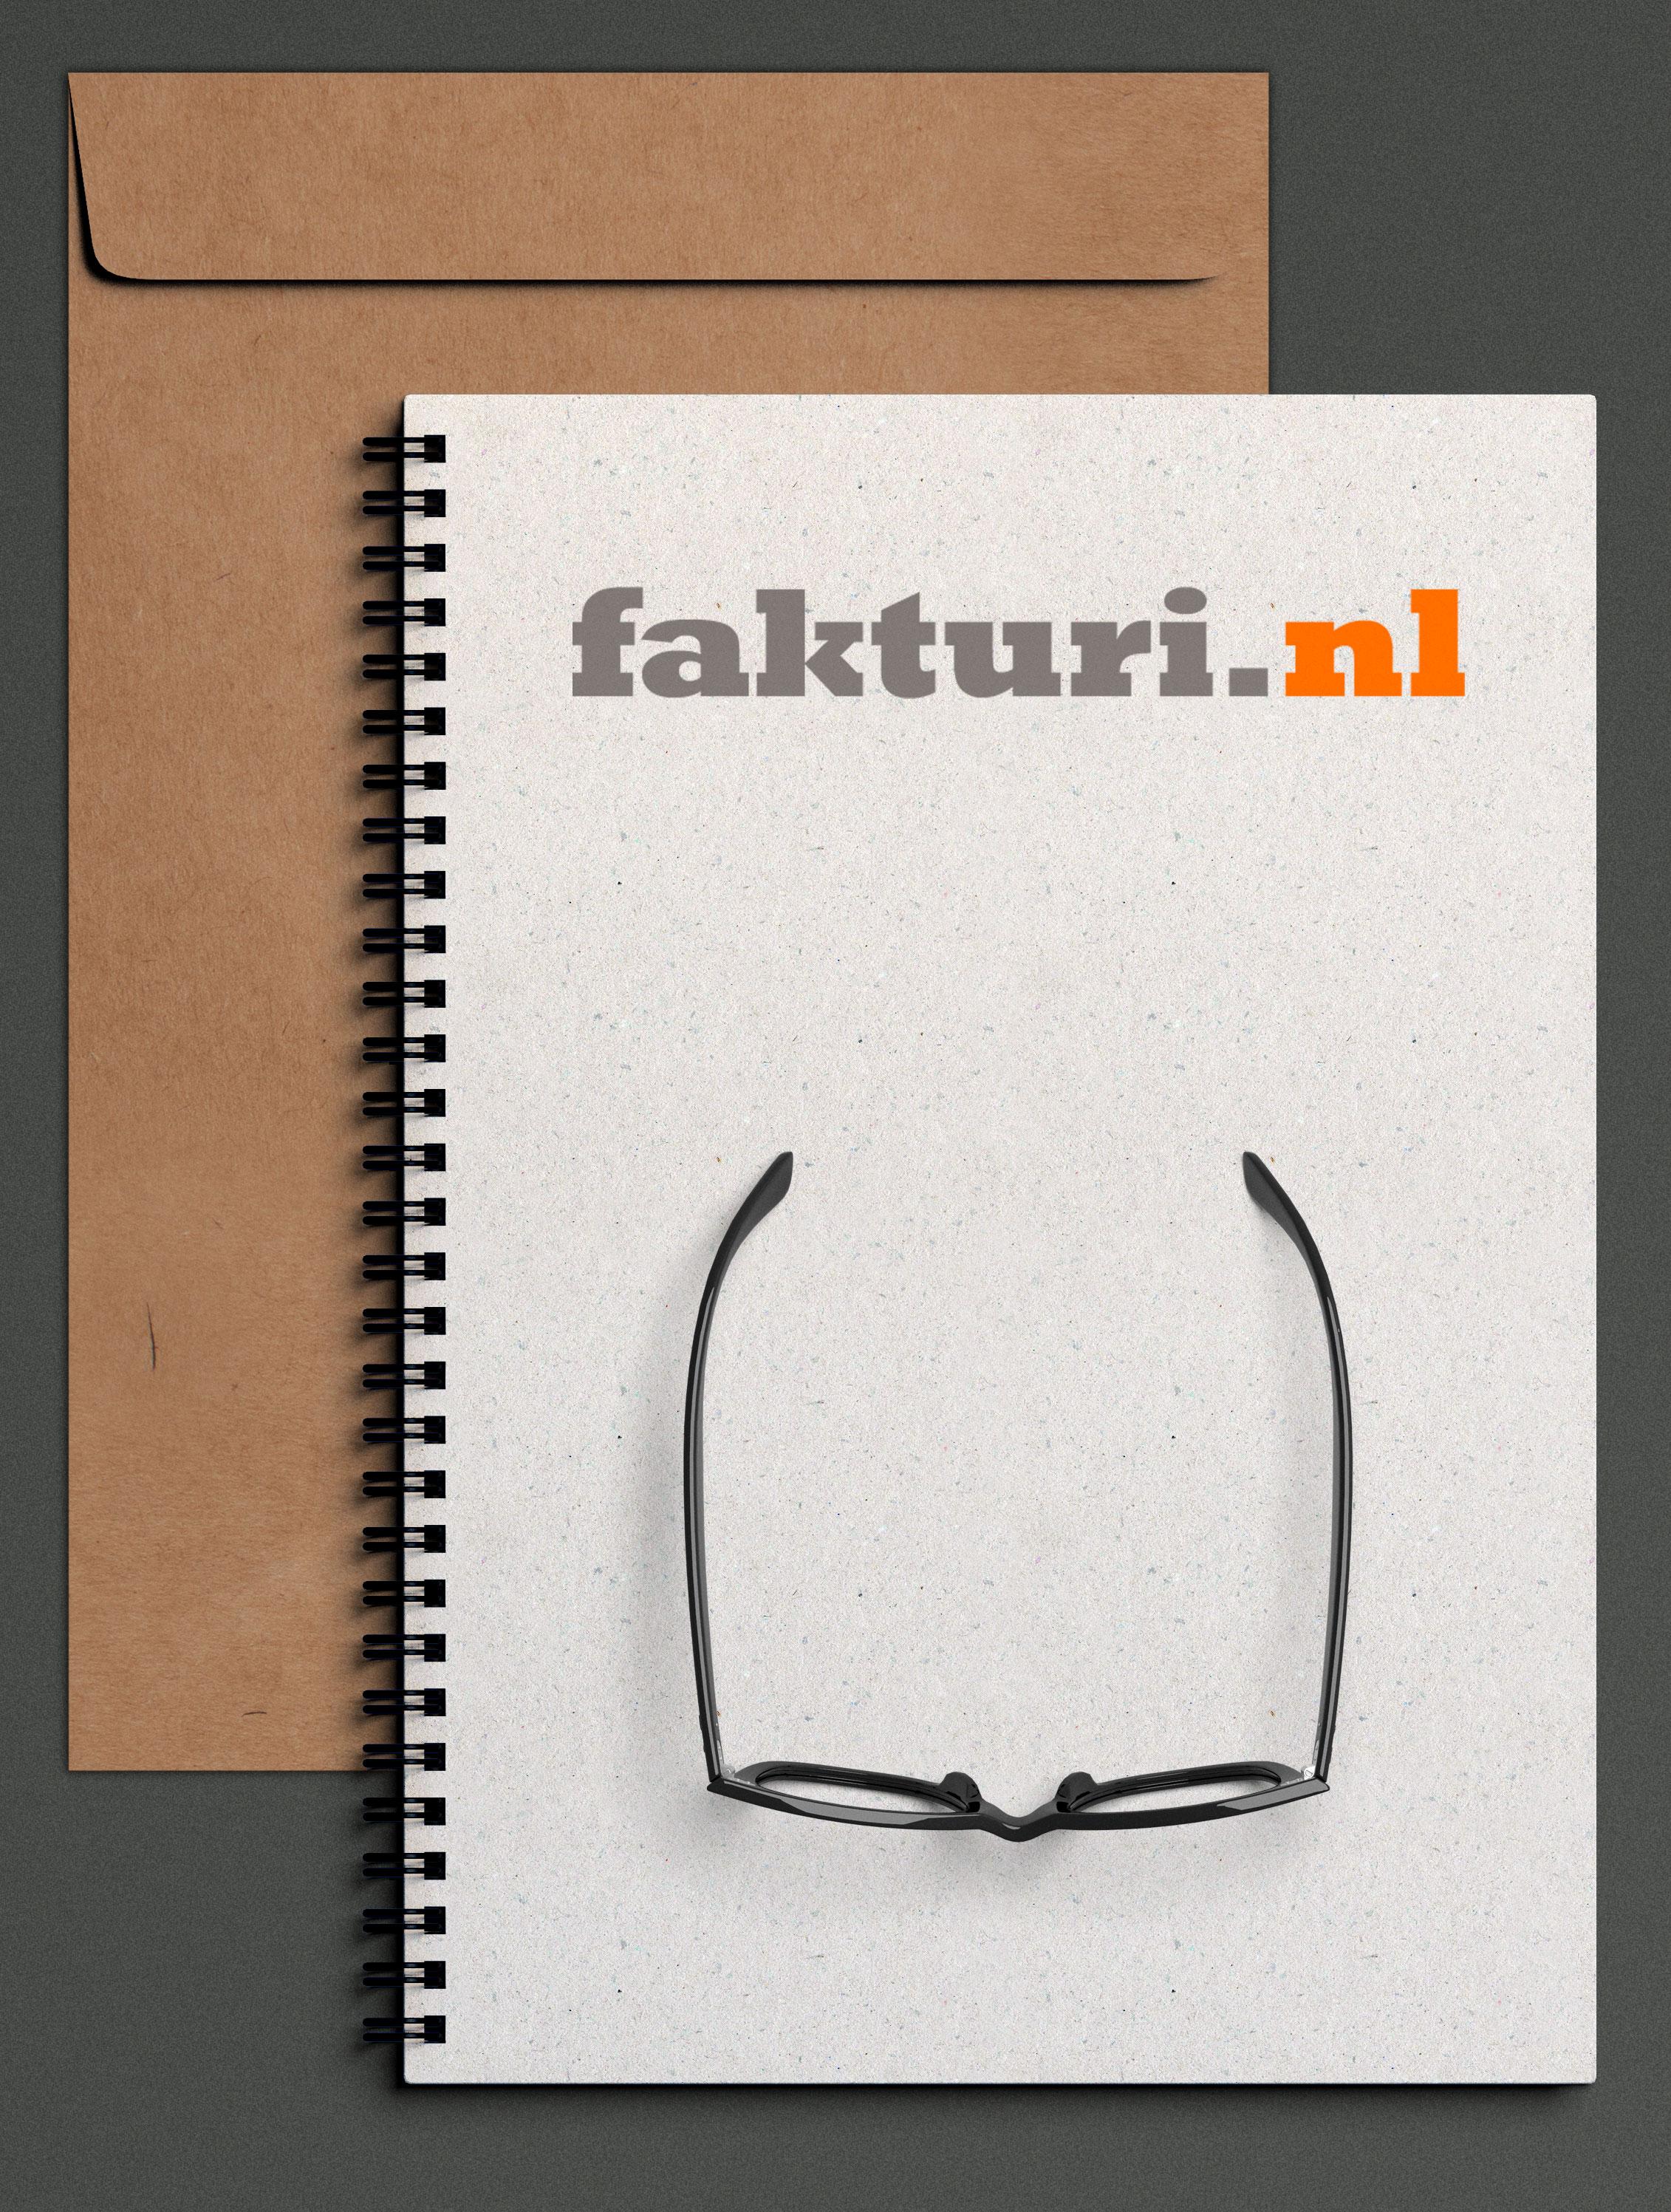 Fakturi.nl